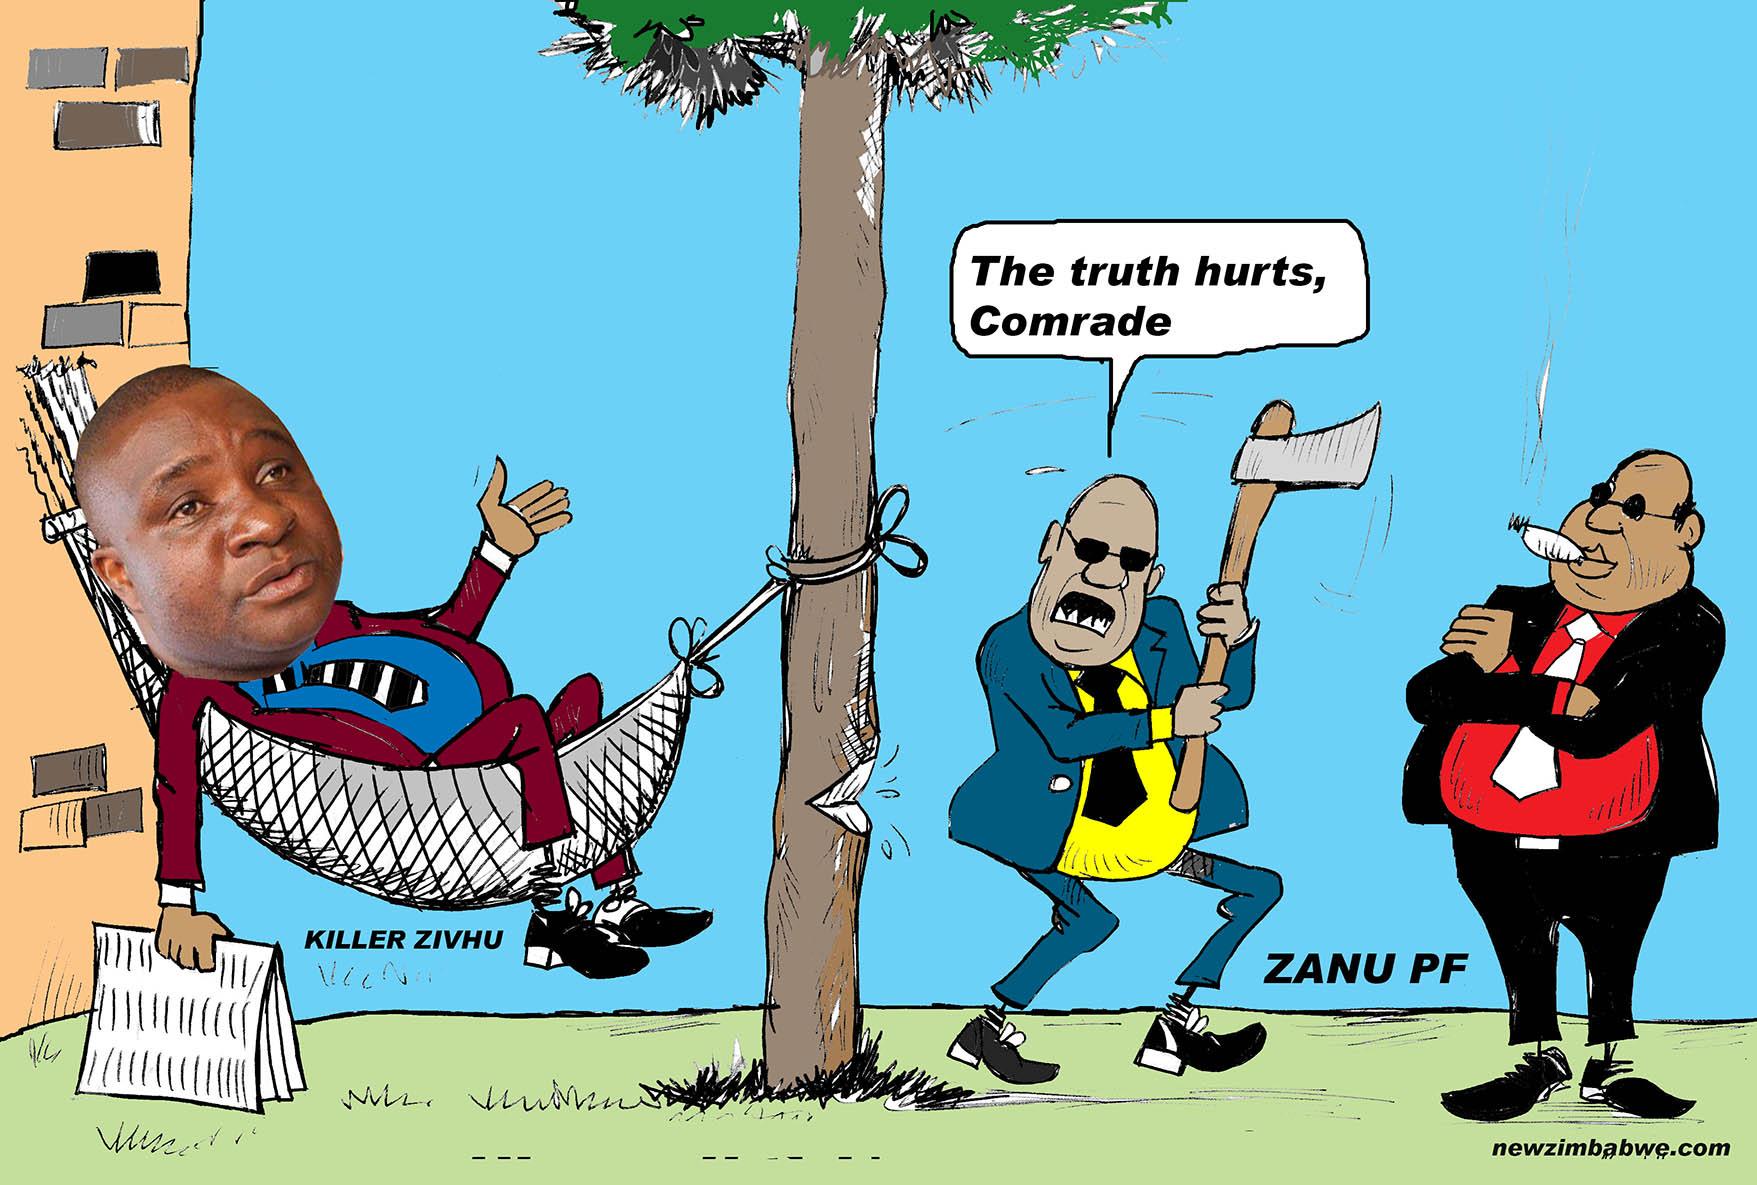 ZANU PF suspends Killer Zivhu